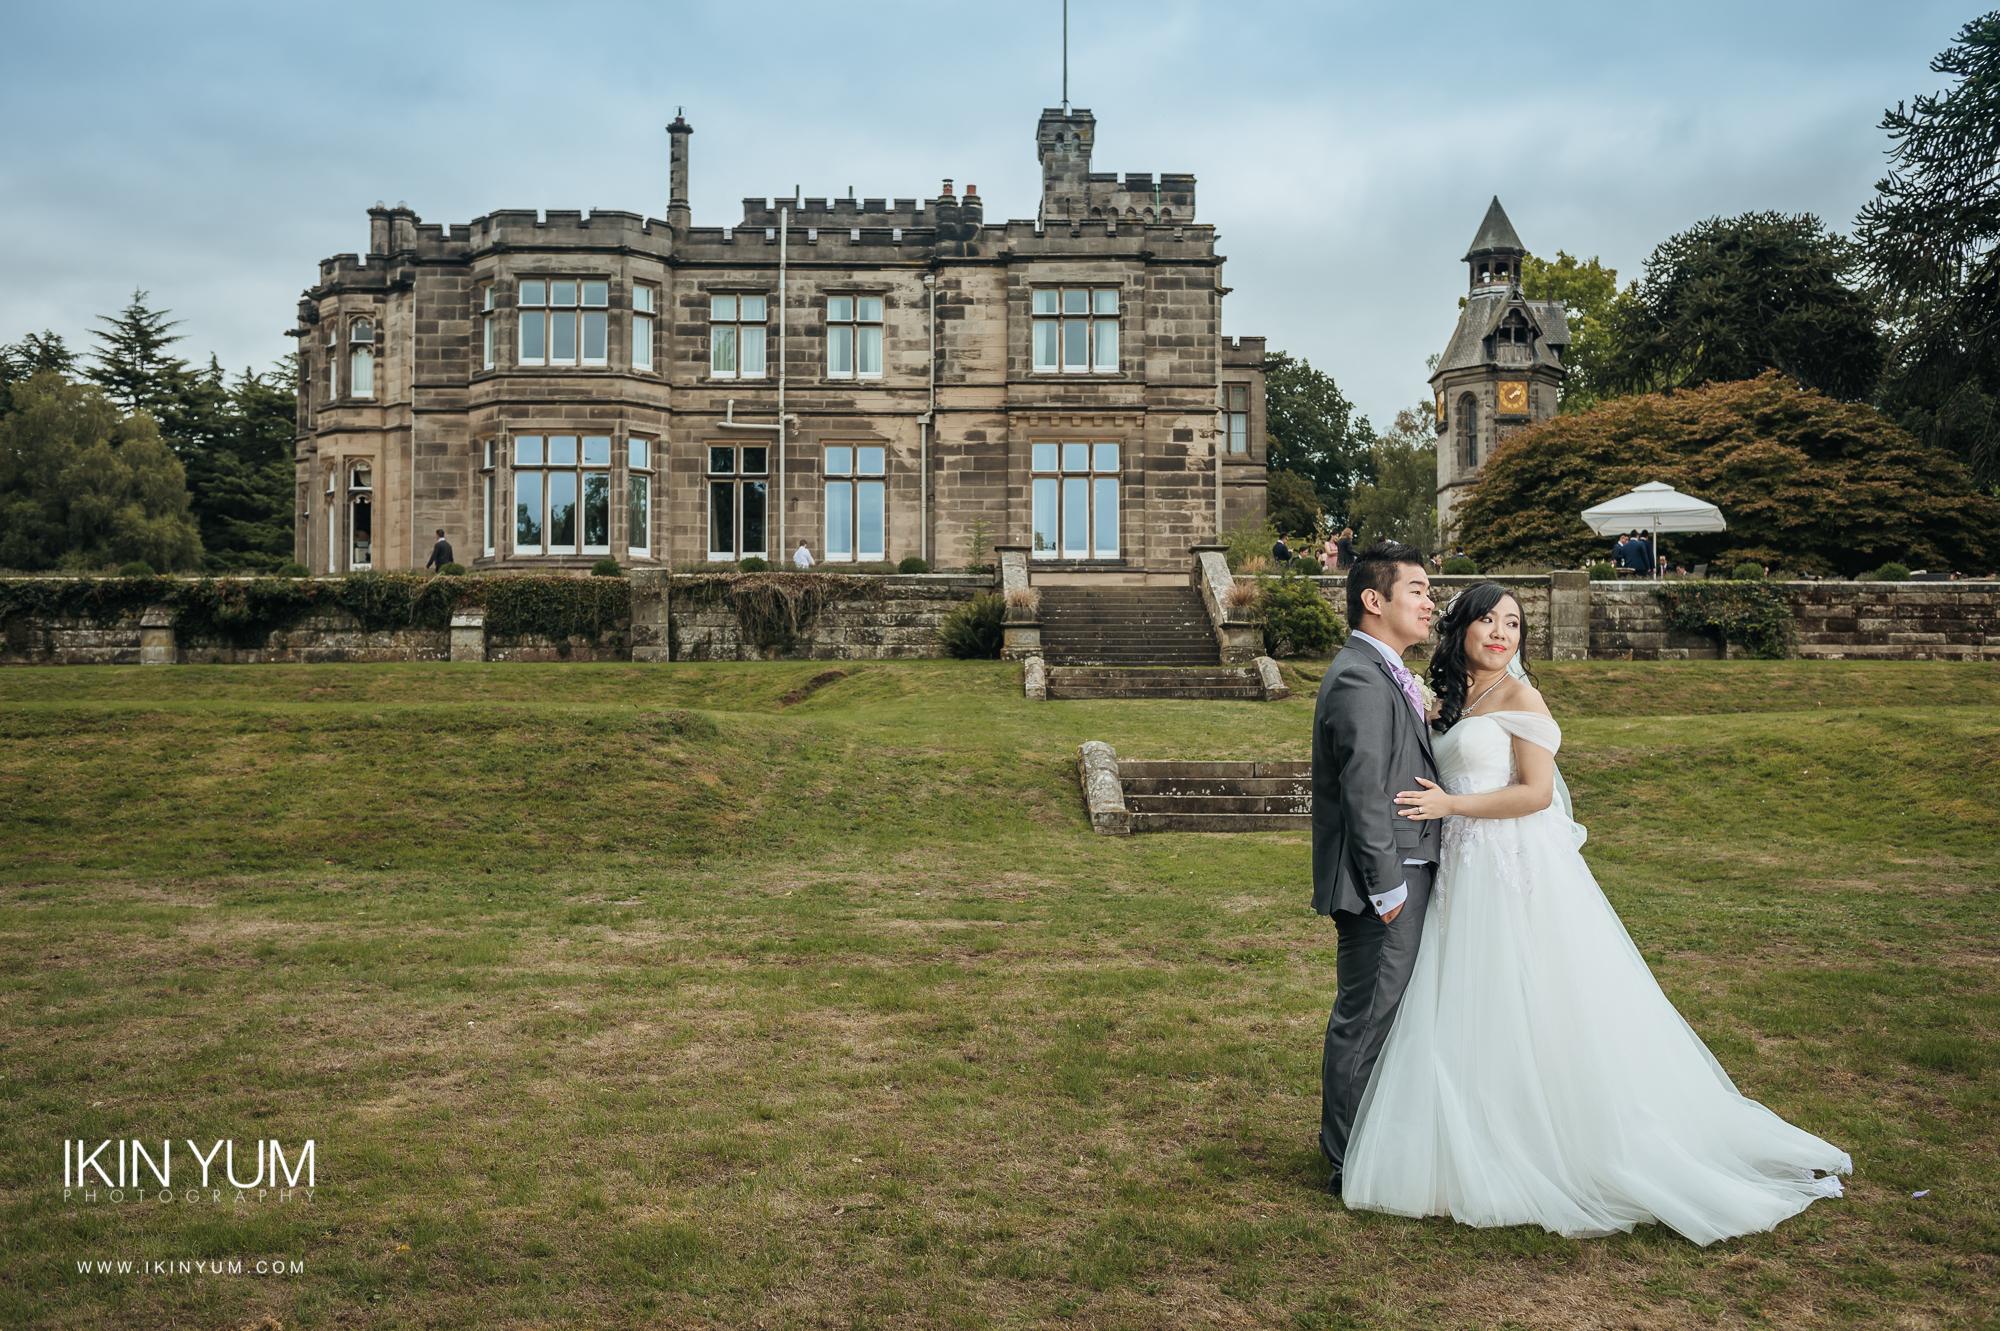 Hampton Manor Wedding - Ikin Yum Photography -101.jpg